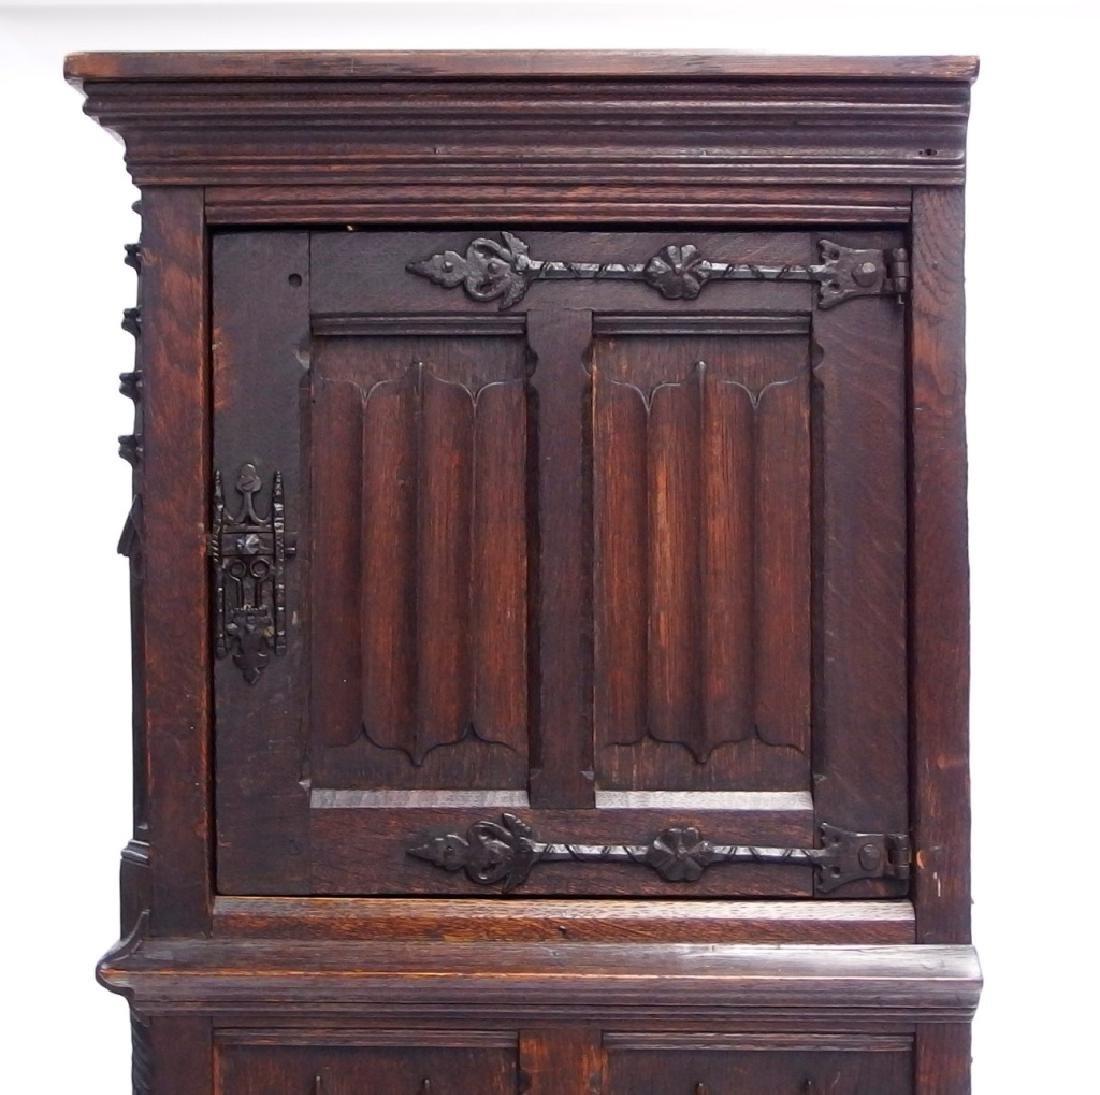 Italian Renaissance Revival Carved Wood Cabinet - 7